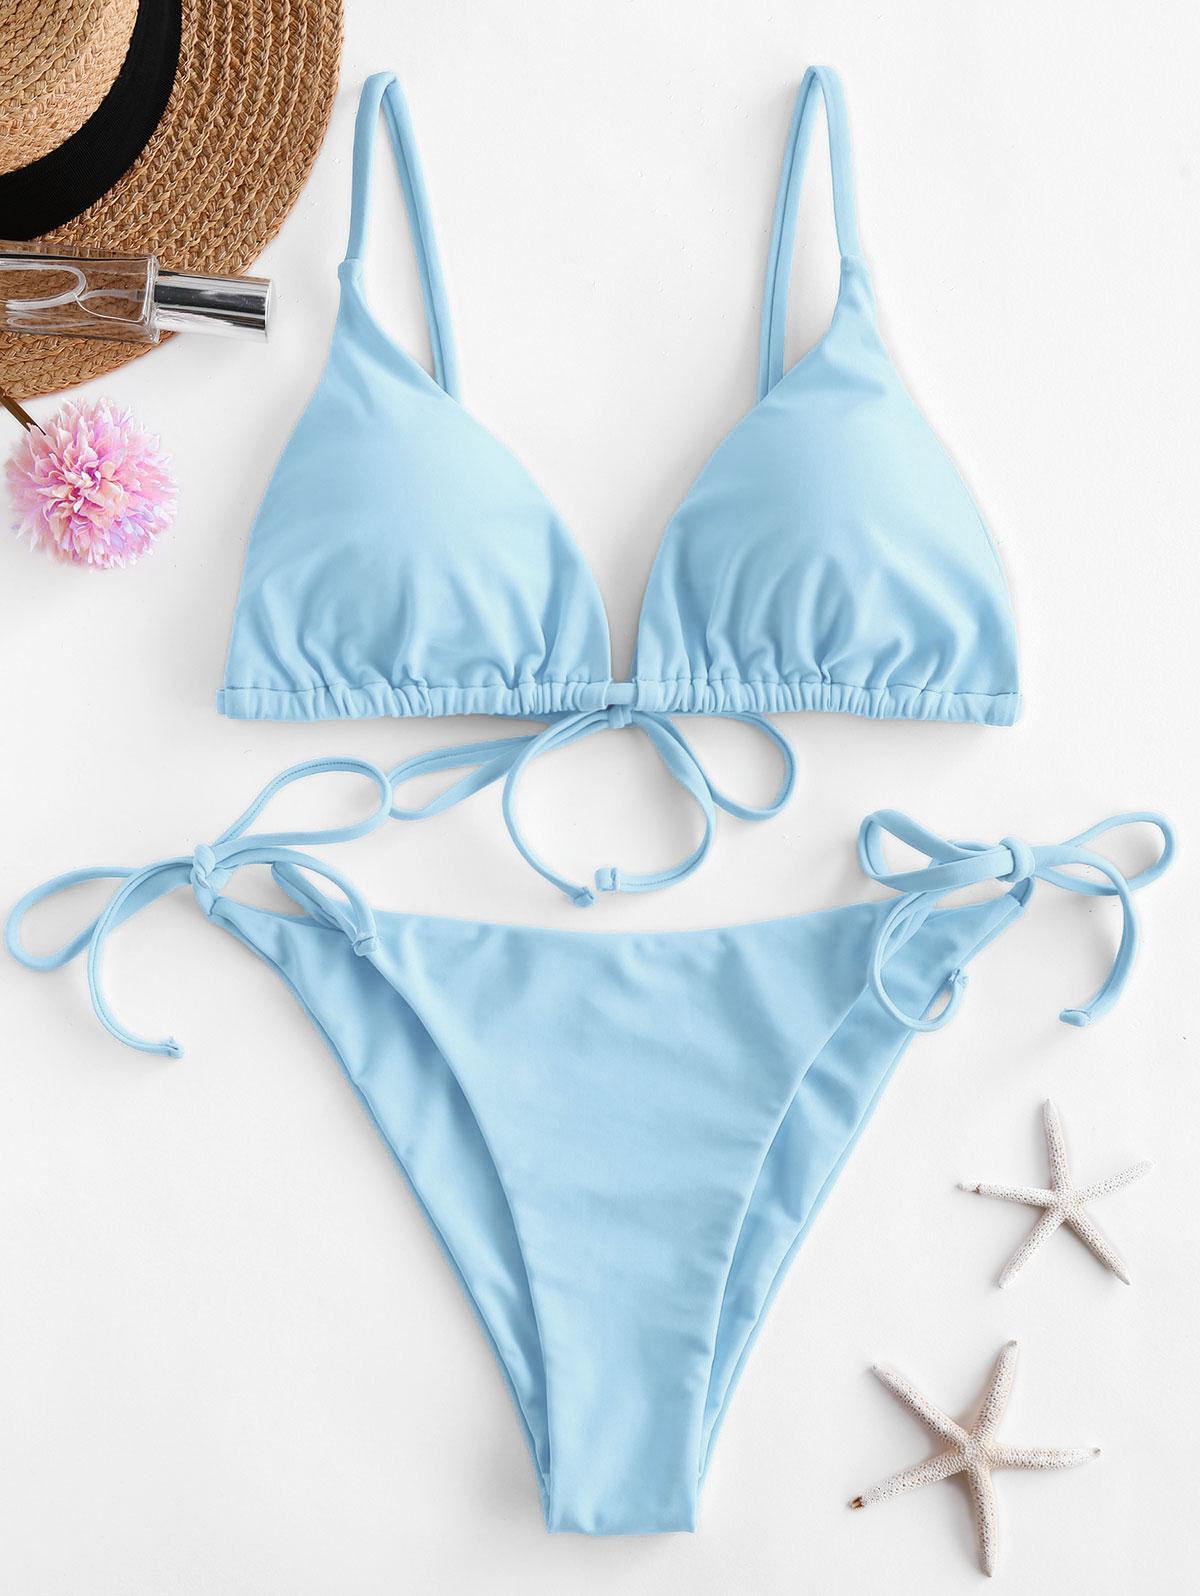 ZAFUL Tie String Bikini Swimsuit  - buy with discount